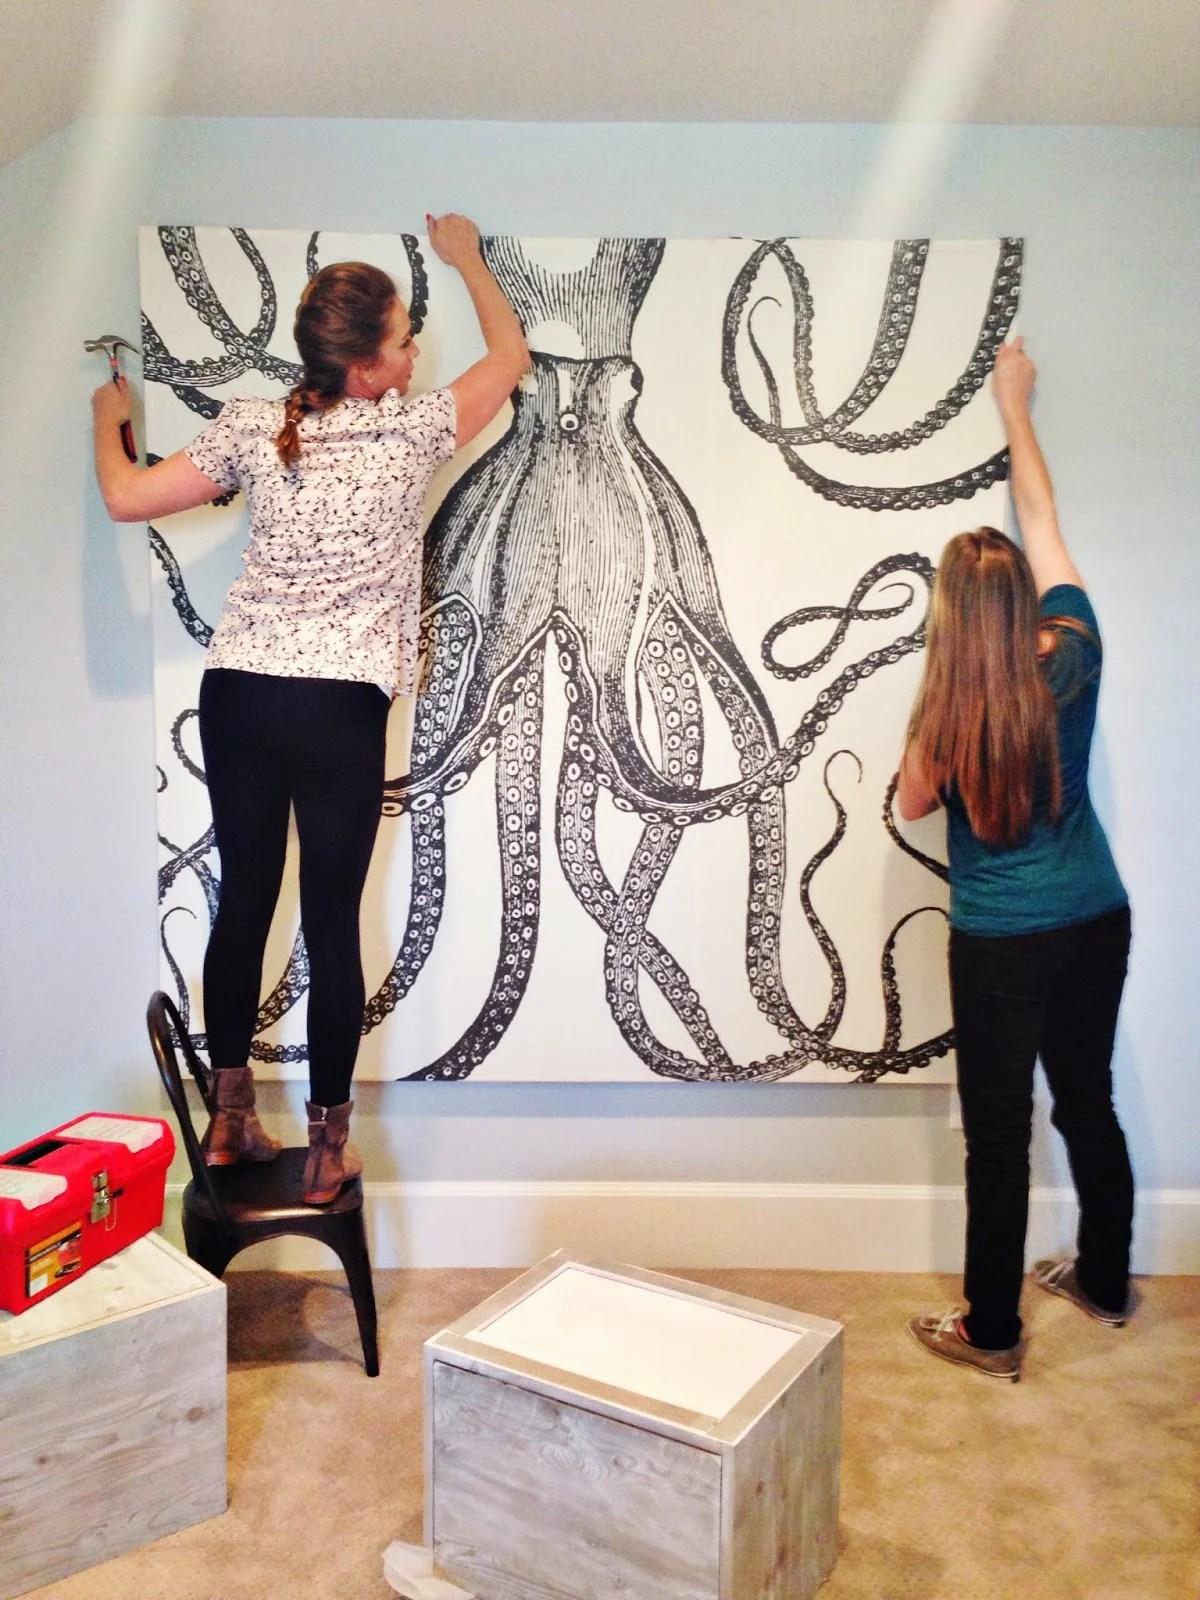 Remodelaholic | 60 Budget-Friendly DIY Large Wall Decor Ideas on Pinterest Wall Decor  id=49057